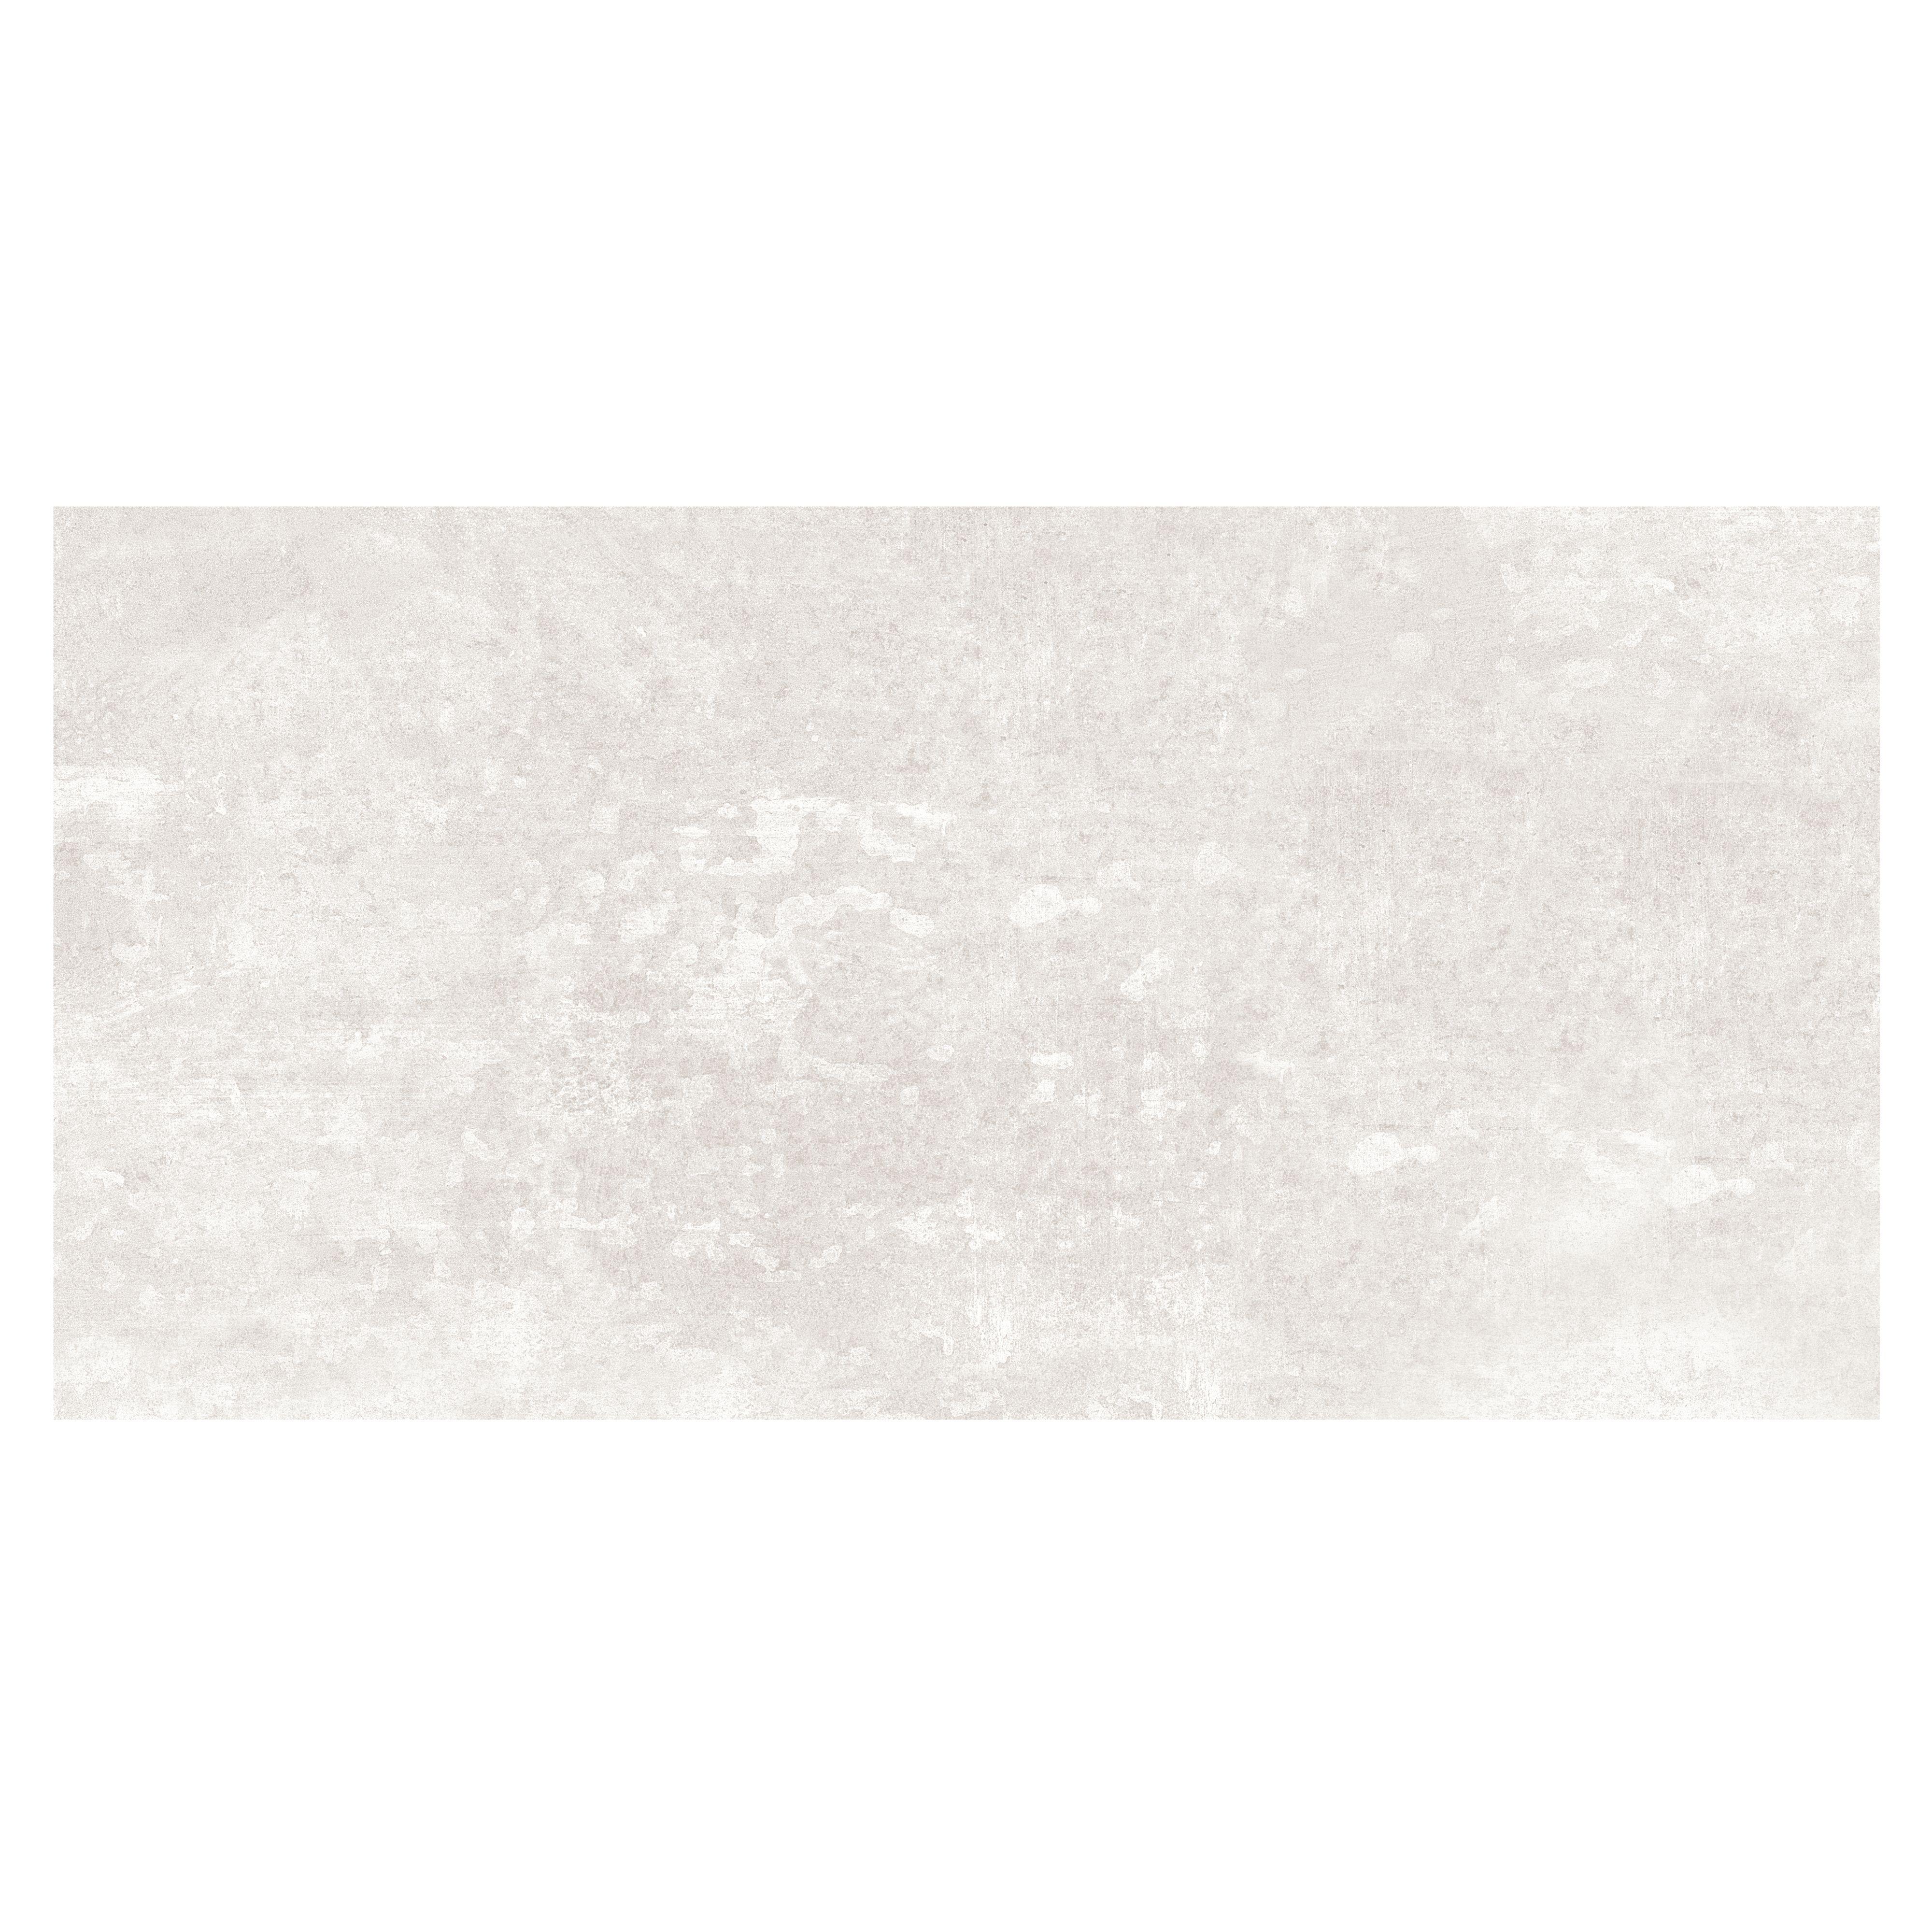 Urban white stone effect ceramic wall floor tile pack of 5 l urban white stone effect ceramic wall floor tile pack of 5 l600mm w300mm departments diy at bq dailygadgetfo Gallery